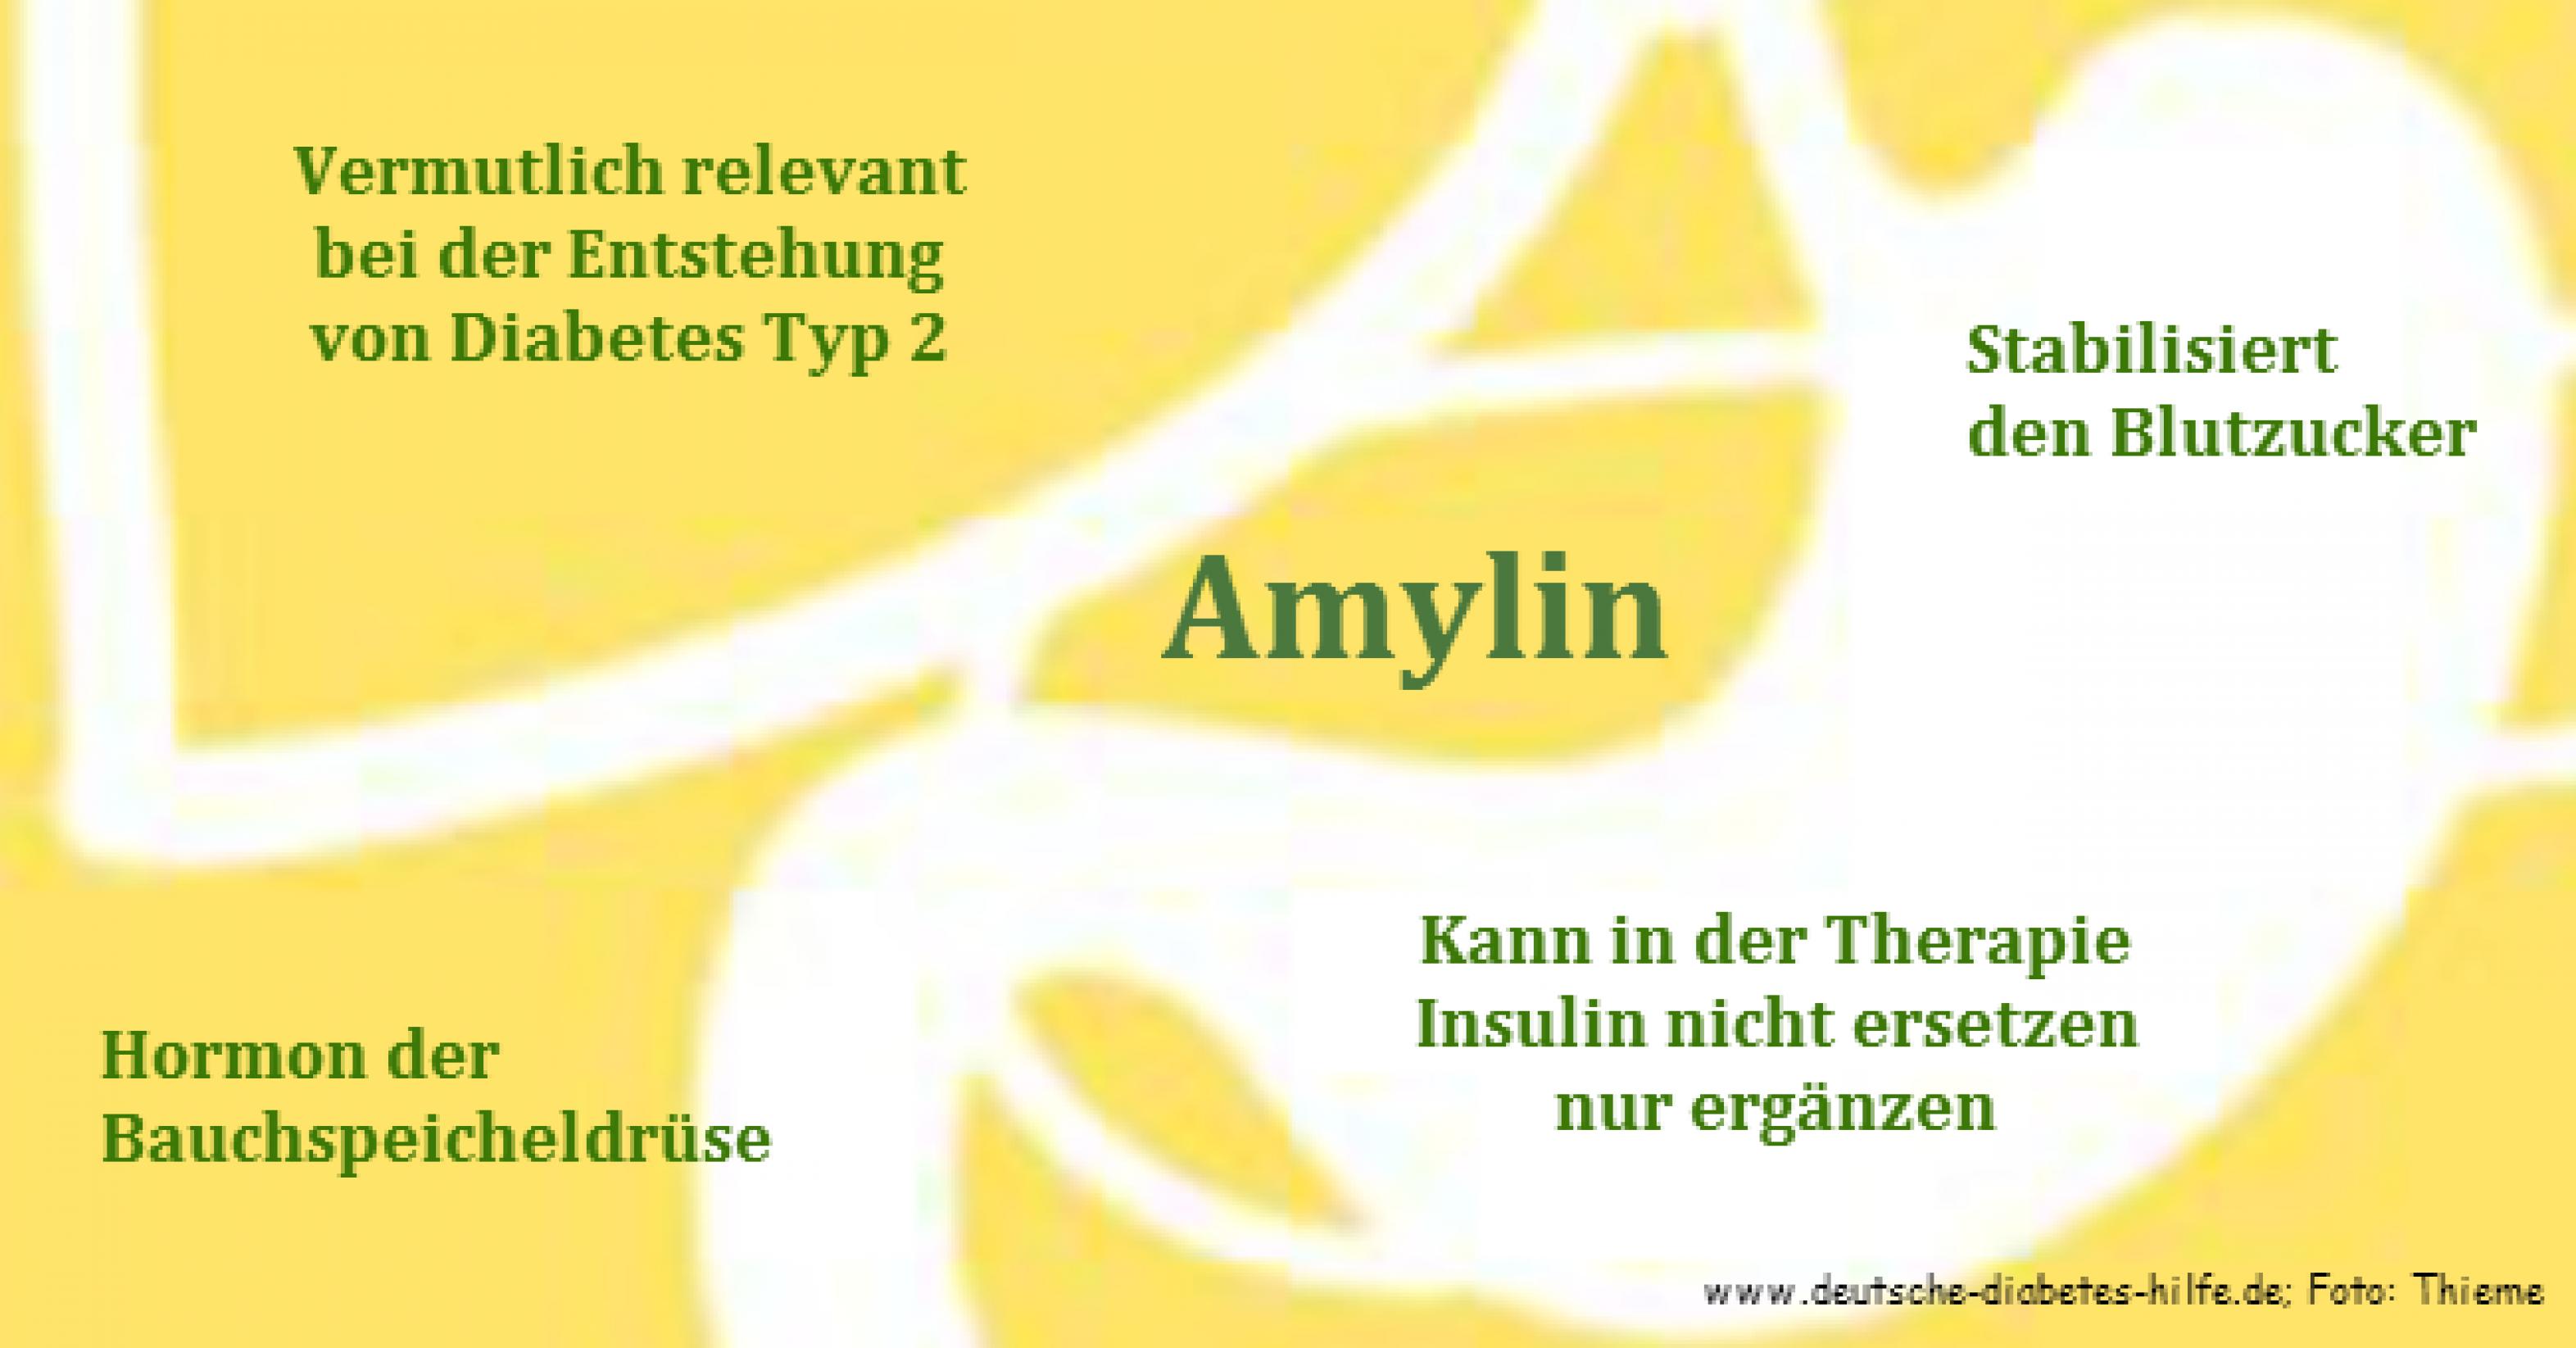 Amylin | diabetesDE - Deutsche Diabetes-Hilfe